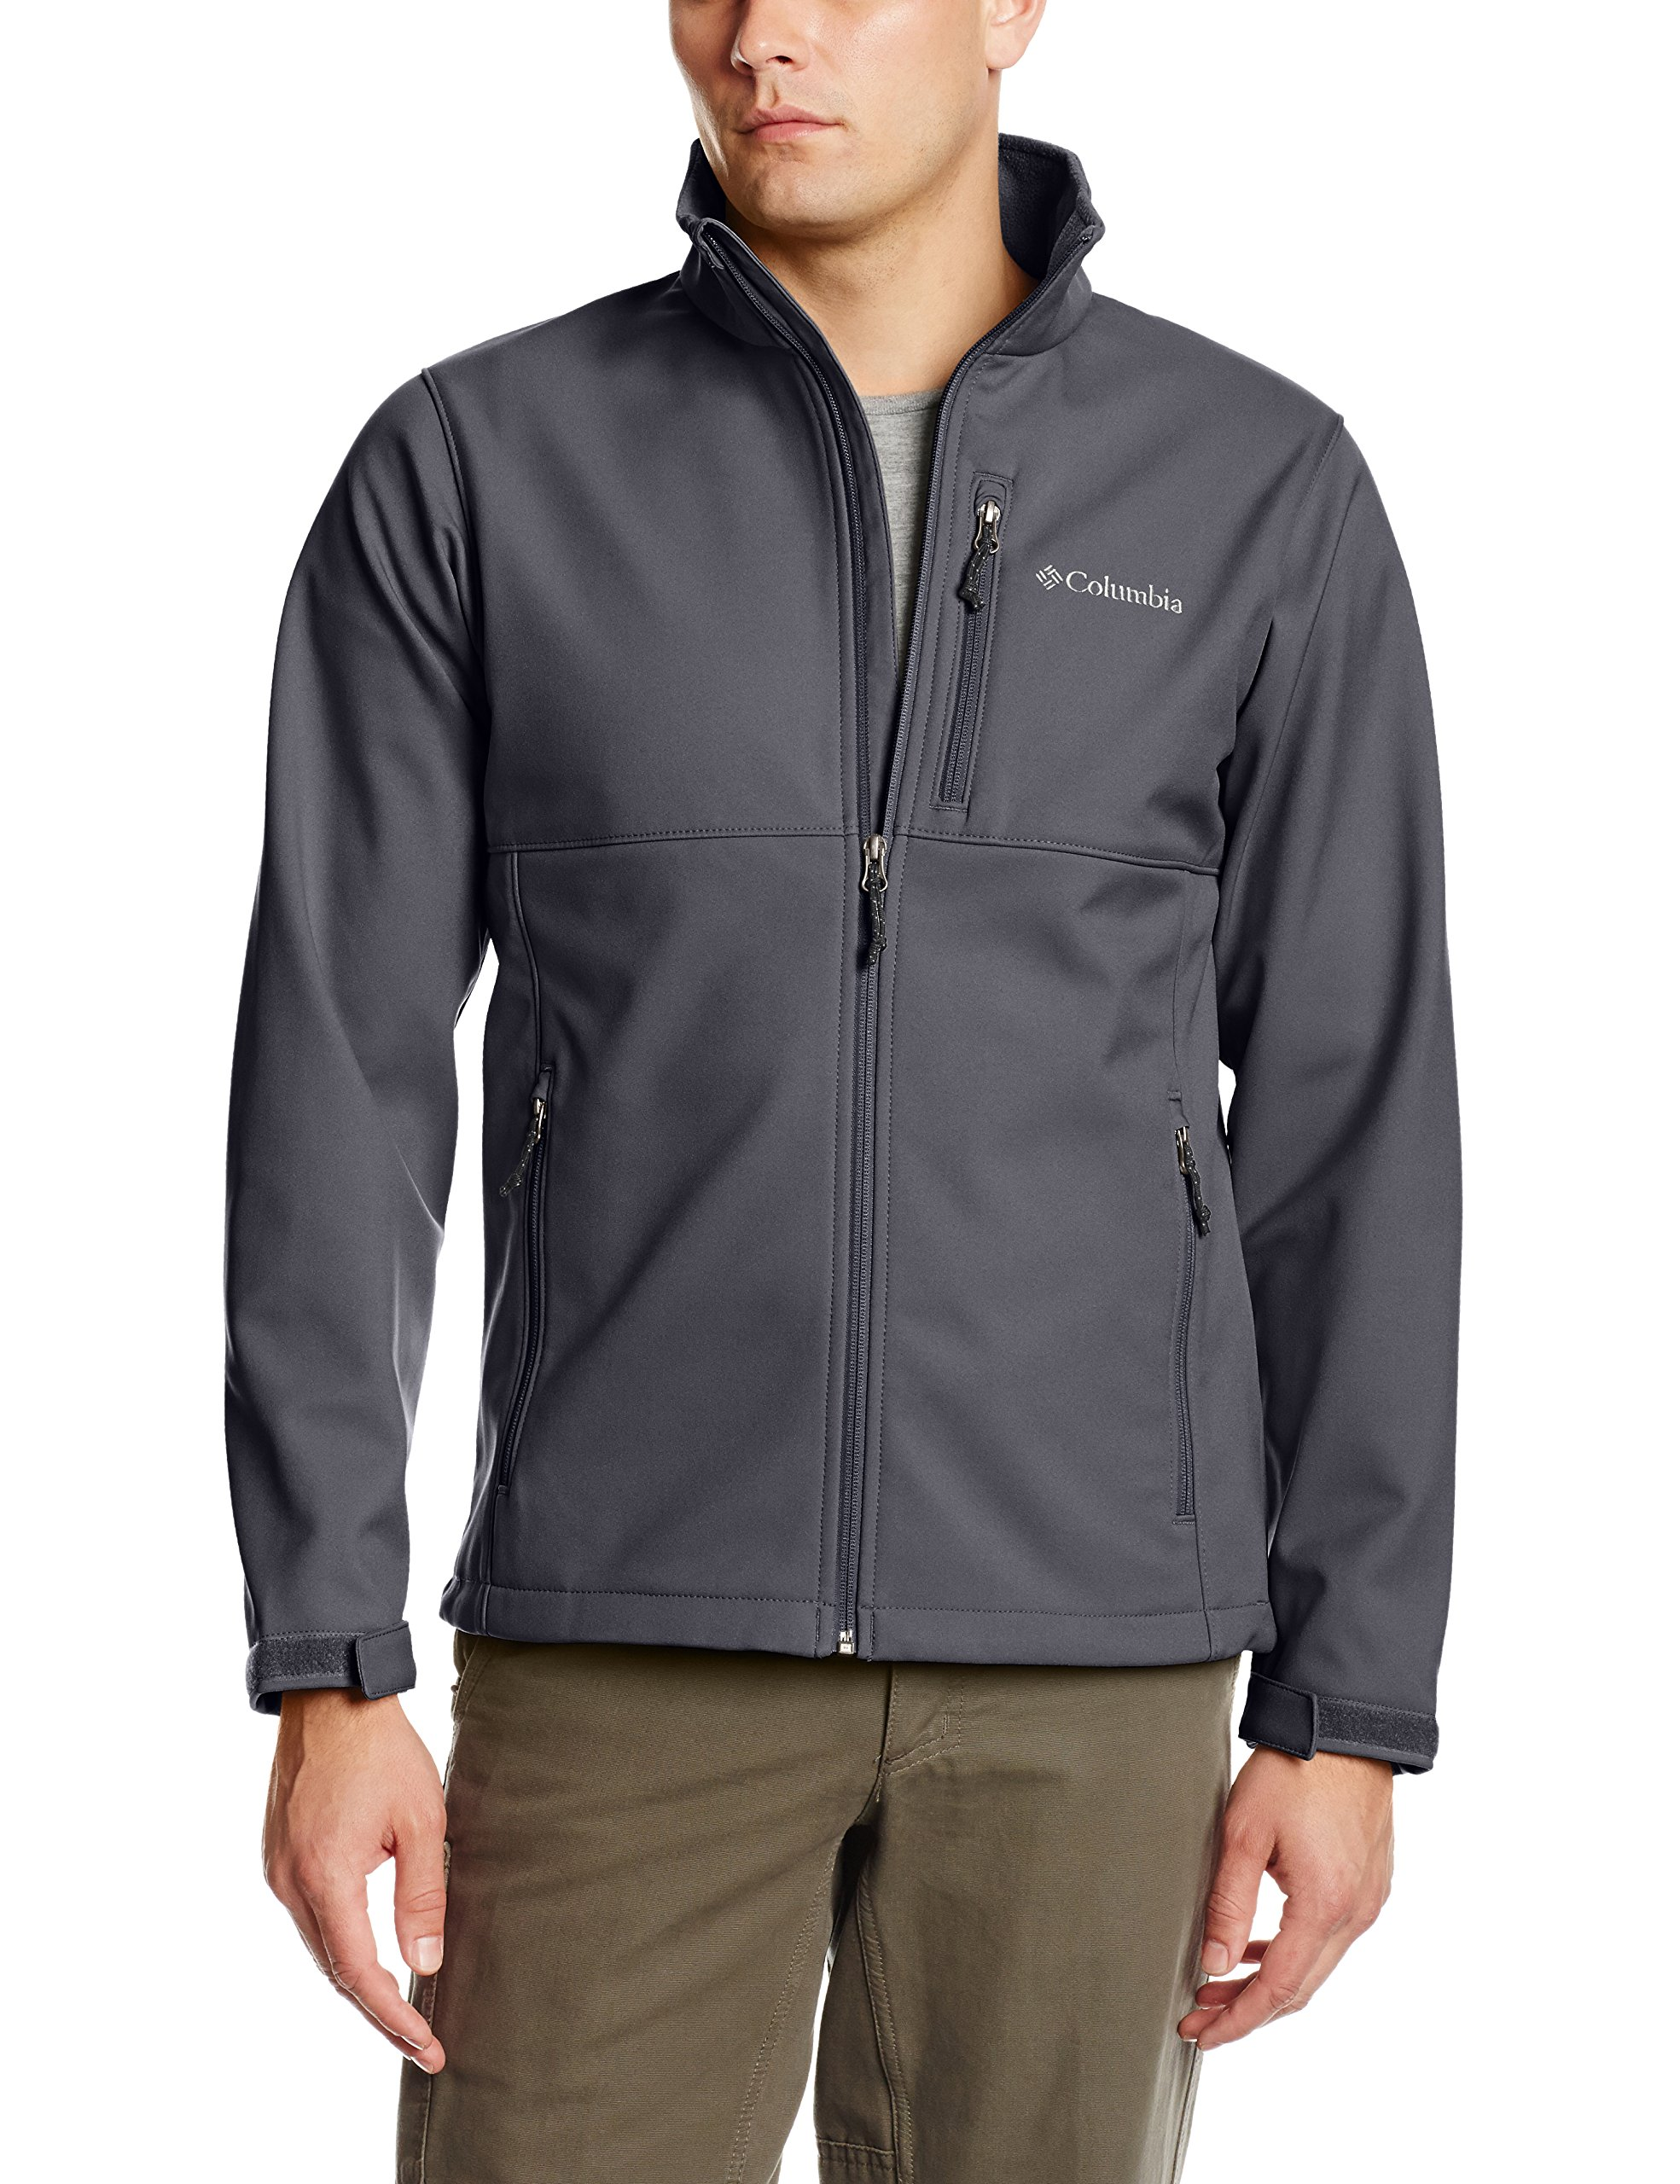 Columbia Men's Big & Tall Ascender Softshell Jacket, Graphite, 3X/Tall